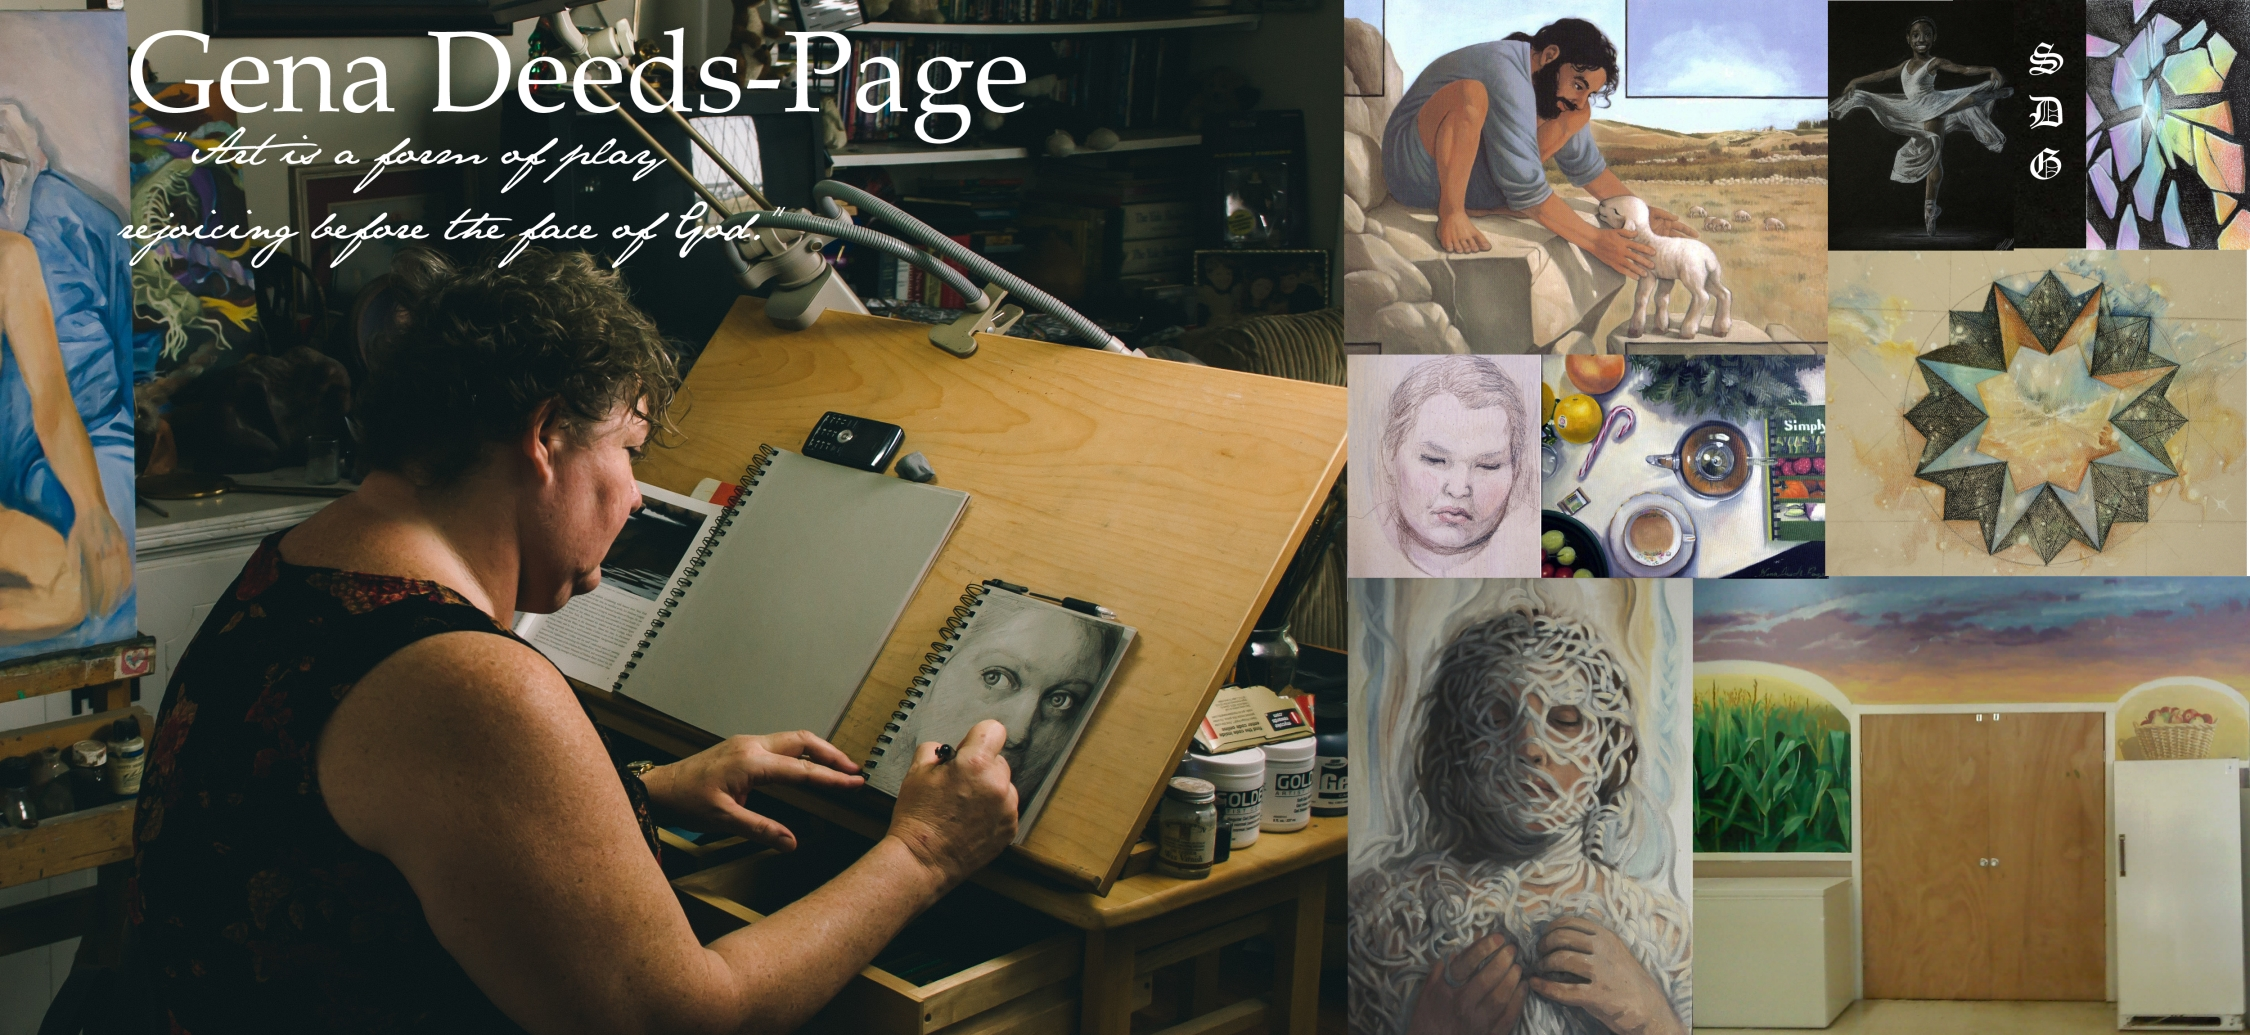 Gena Deeds-Page, Artist & Illustrator